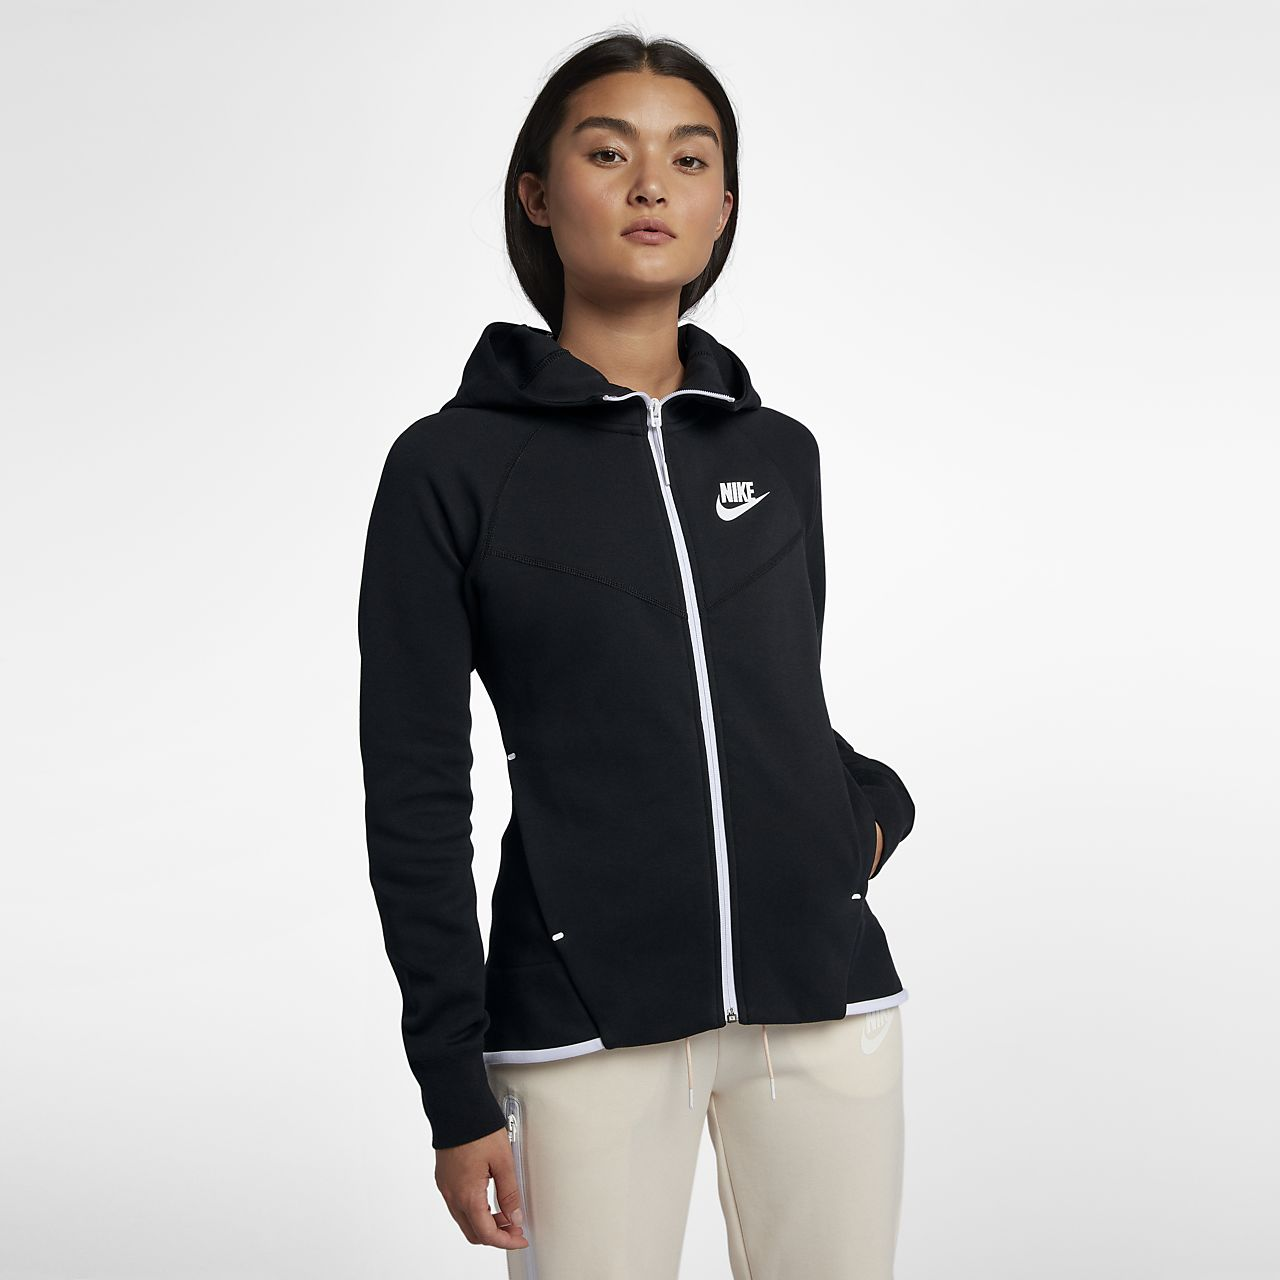 e06b5ac6 Nike Sportswear Tech Fleece Windrunner hettejakke for dame. Nike.com NO